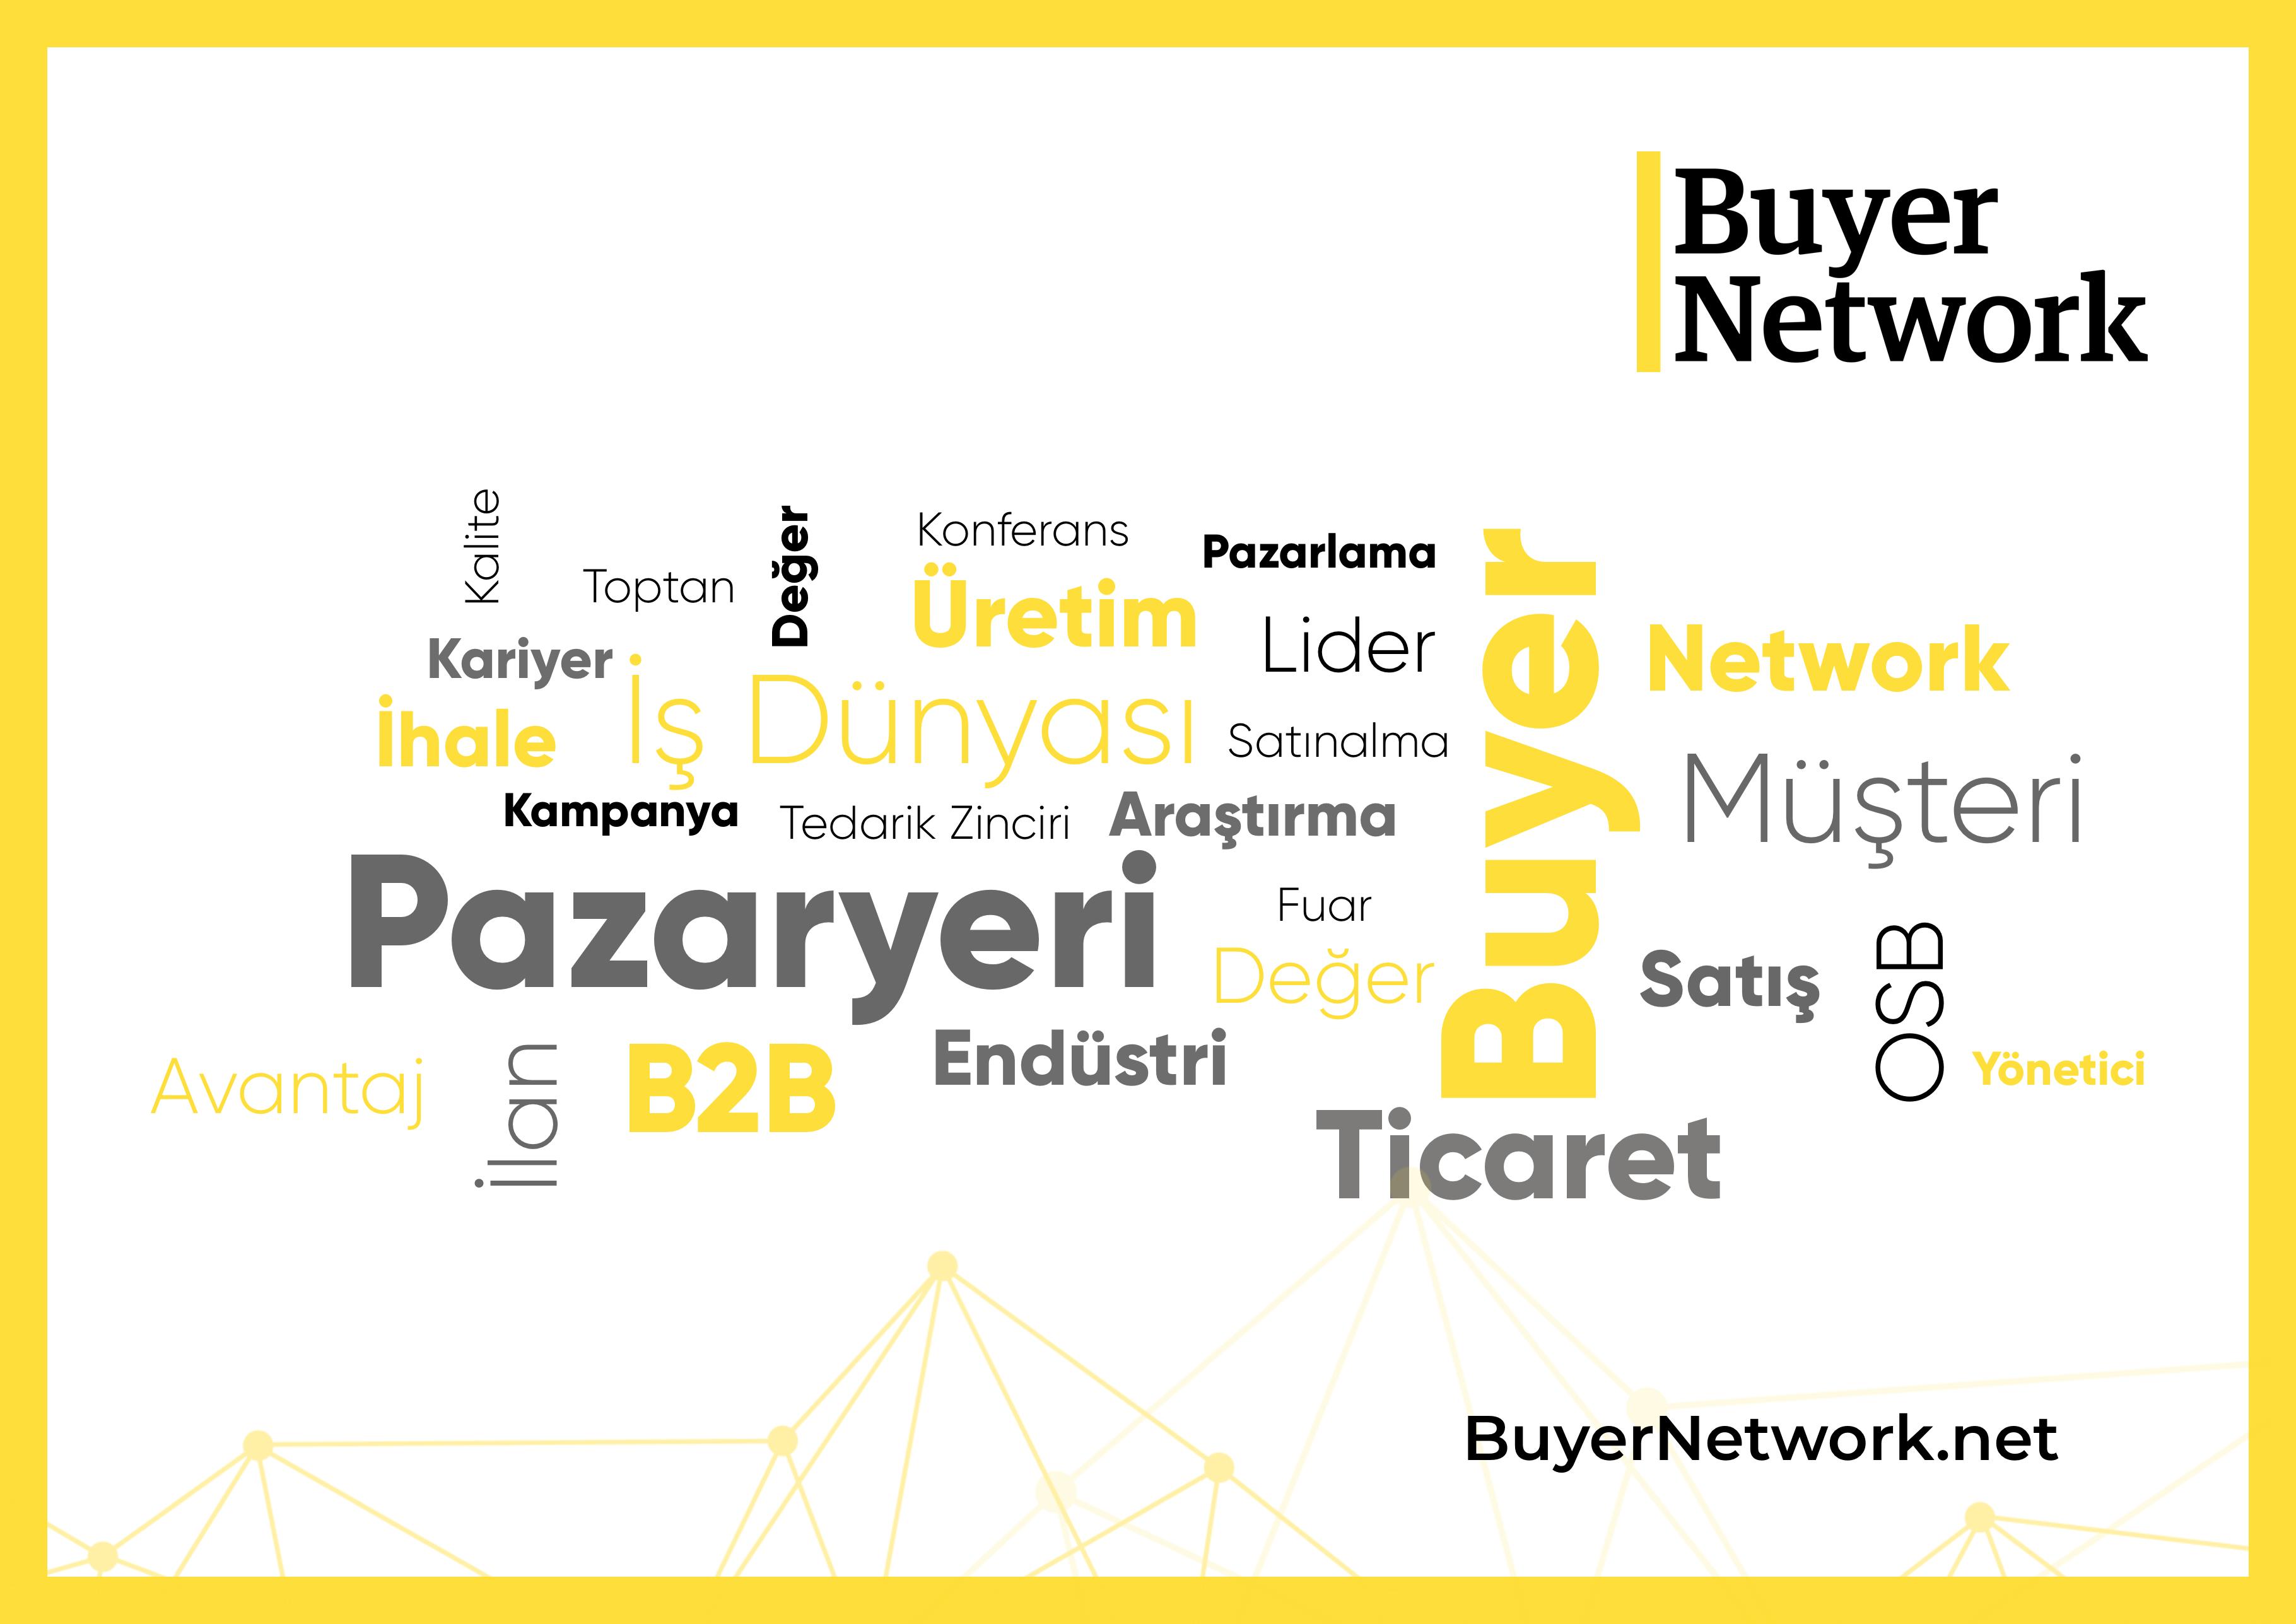 http://www.tedarikzinciri.org/wp-content/uploads/2019/09/Buyer_Network_B2B_kurumsal_pazaryeri.png